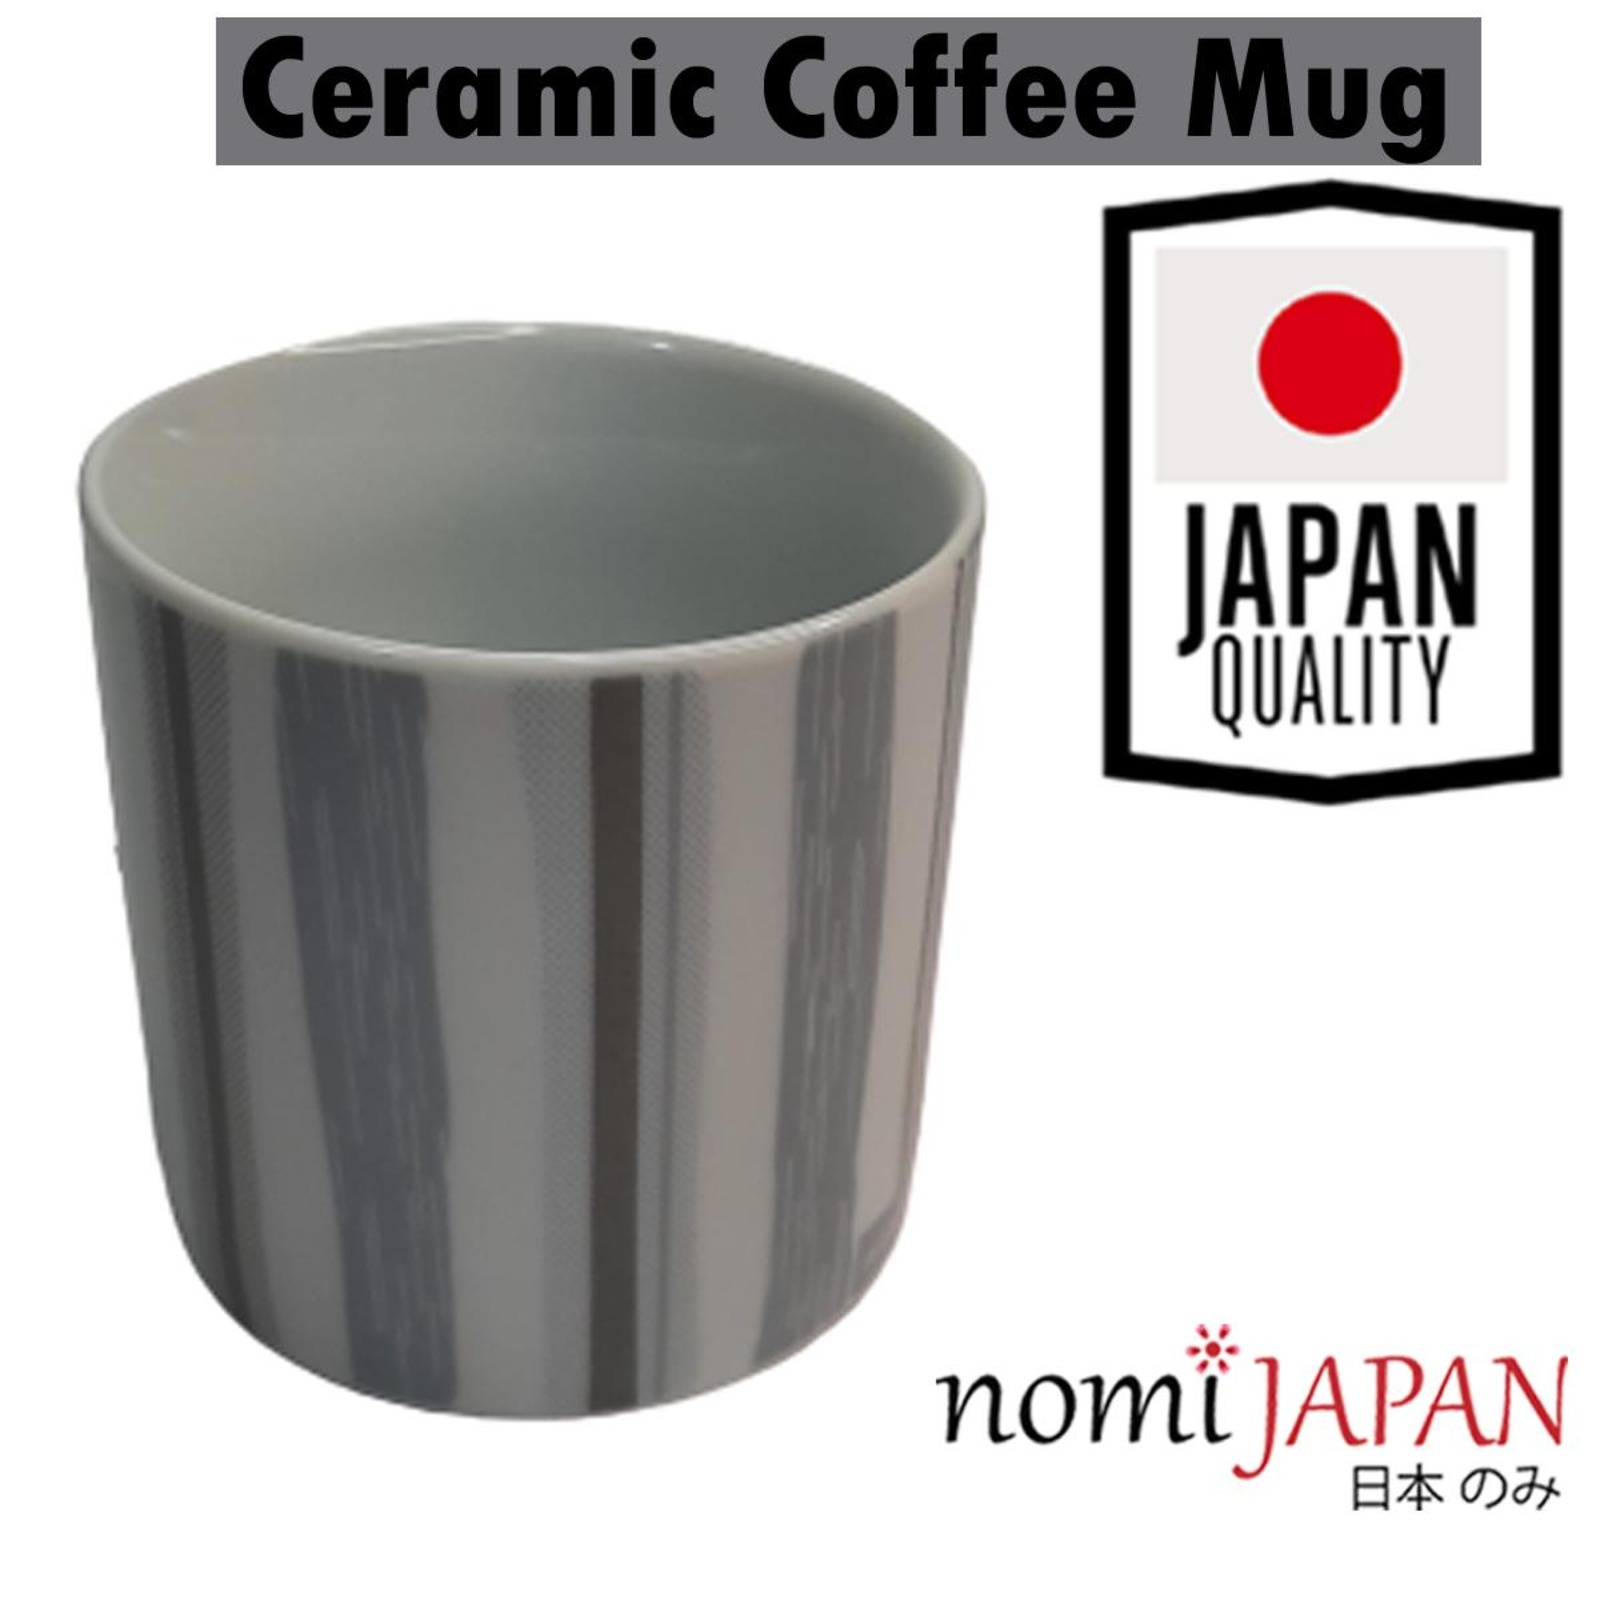 Nomi Japan Ceramic Coffee Mug With Grey Printed Lines Ntuc Fairprice